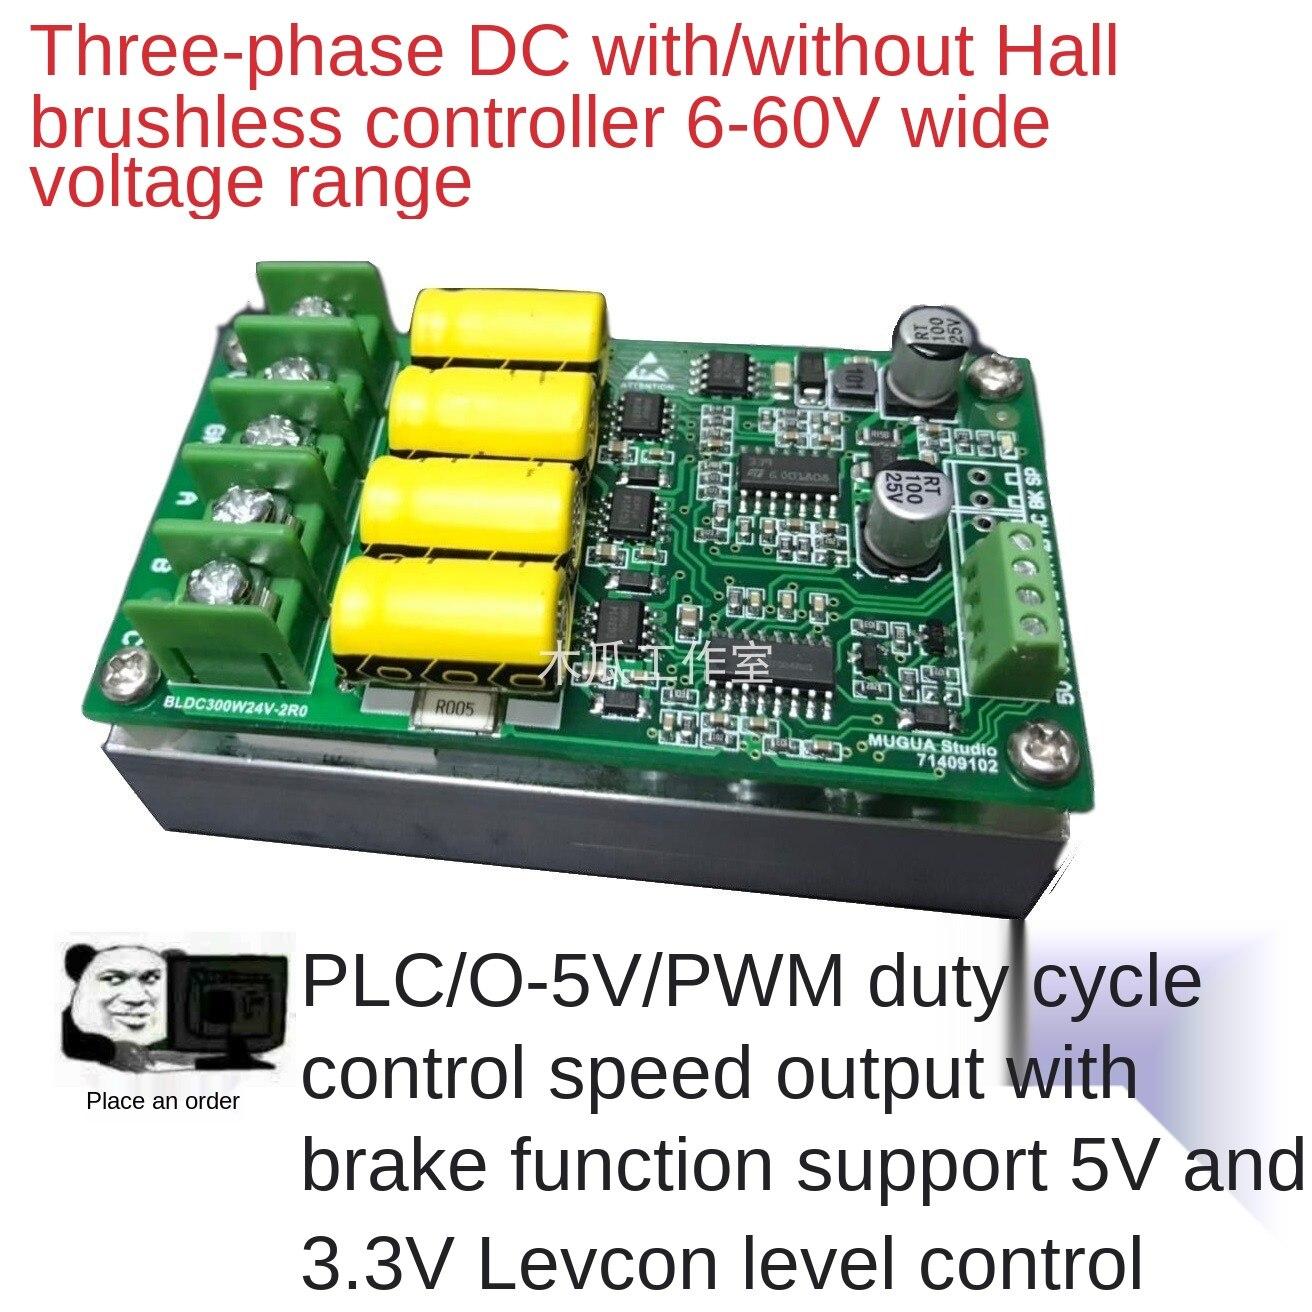 BLDC ثلاث مراحل فرش تيار مستمر حثي قاعة PWM مروحة محرك PLC التحكم في سرعة محرك تحكم